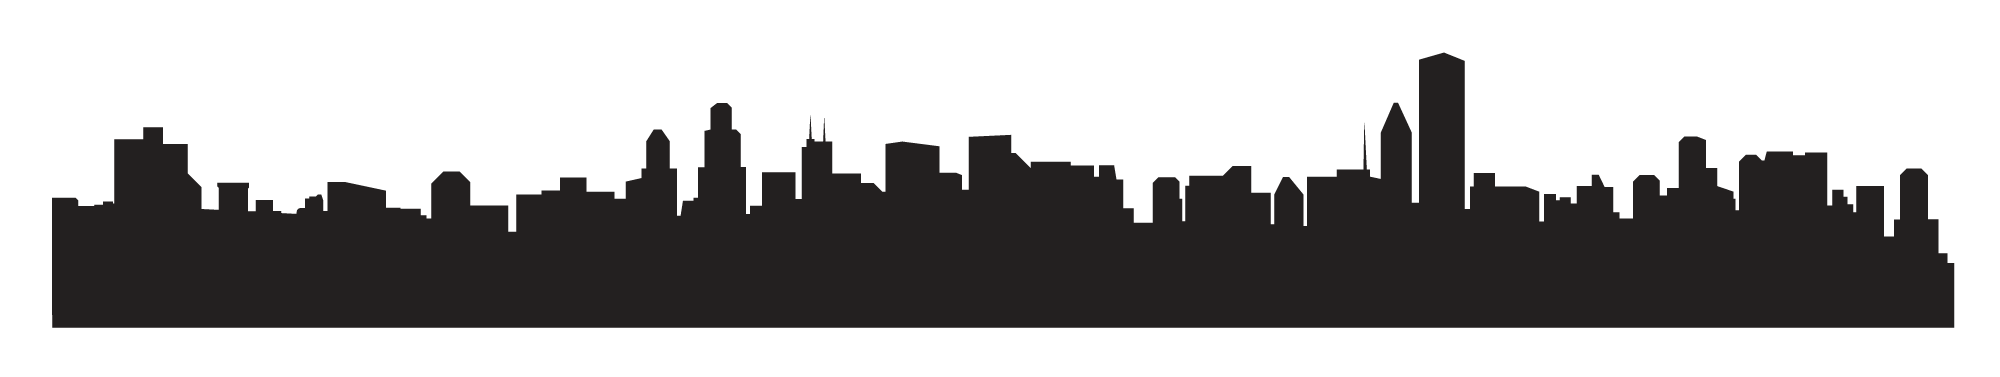 2000x377 Minneapolis Skyline Tattoo